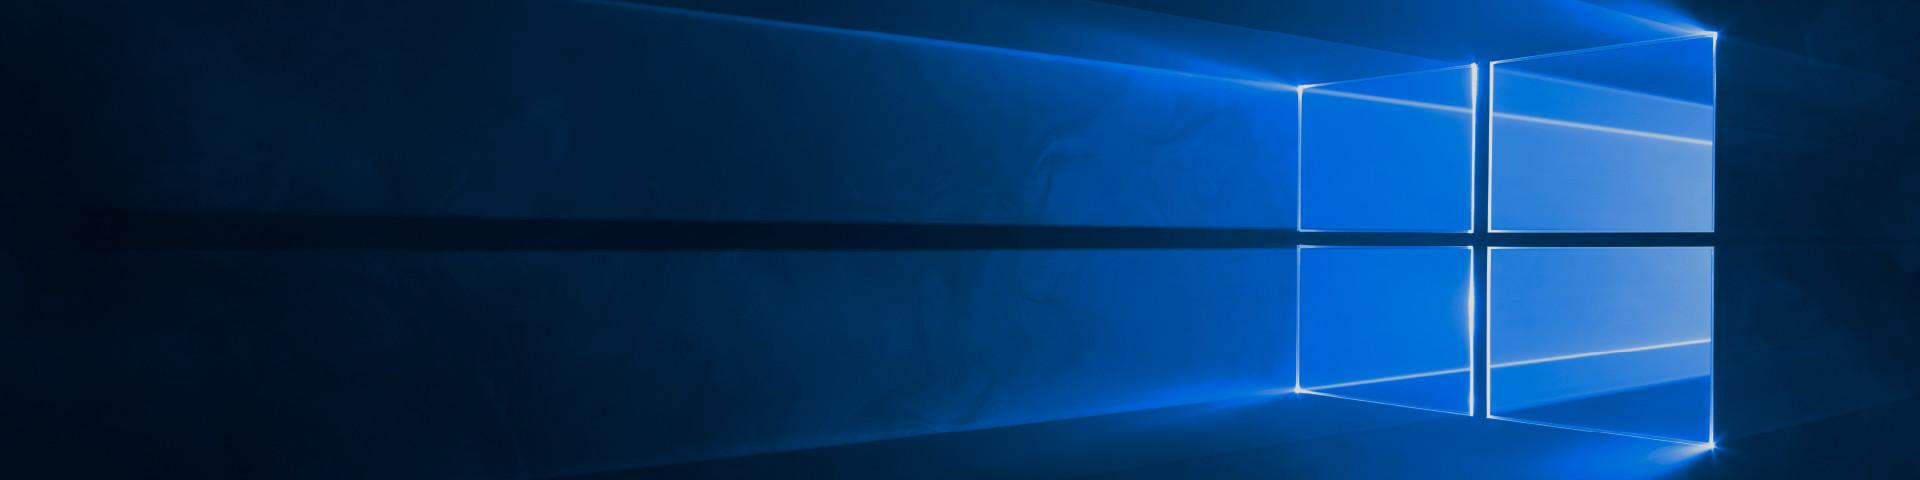 Nå kan du laste ned Windows 10 kostnadsfritt.*